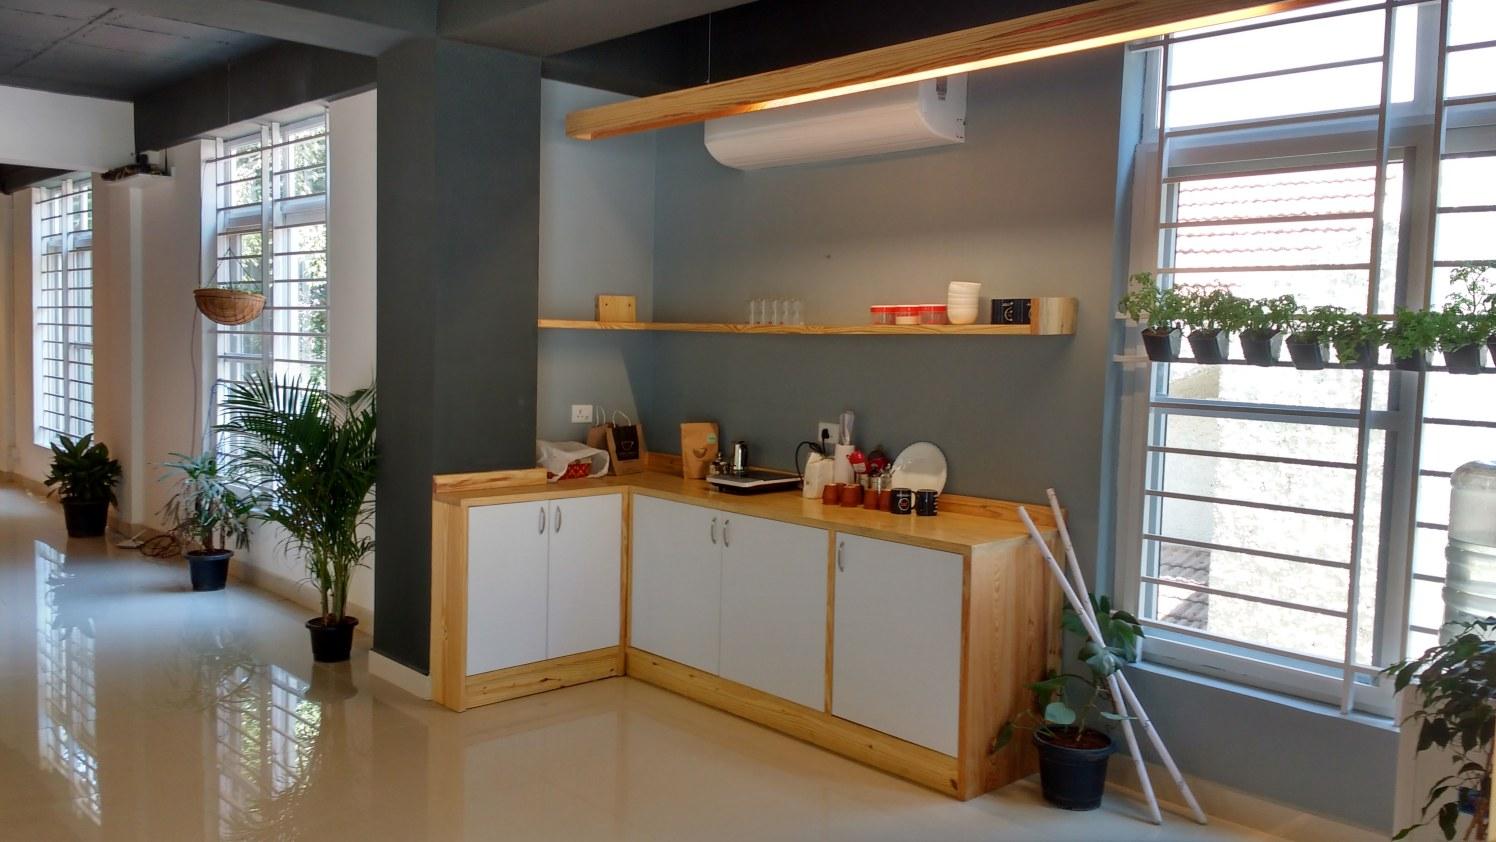 simply wow open kitchen by Anirban Das Modern | Interior Design Photos & Ideas